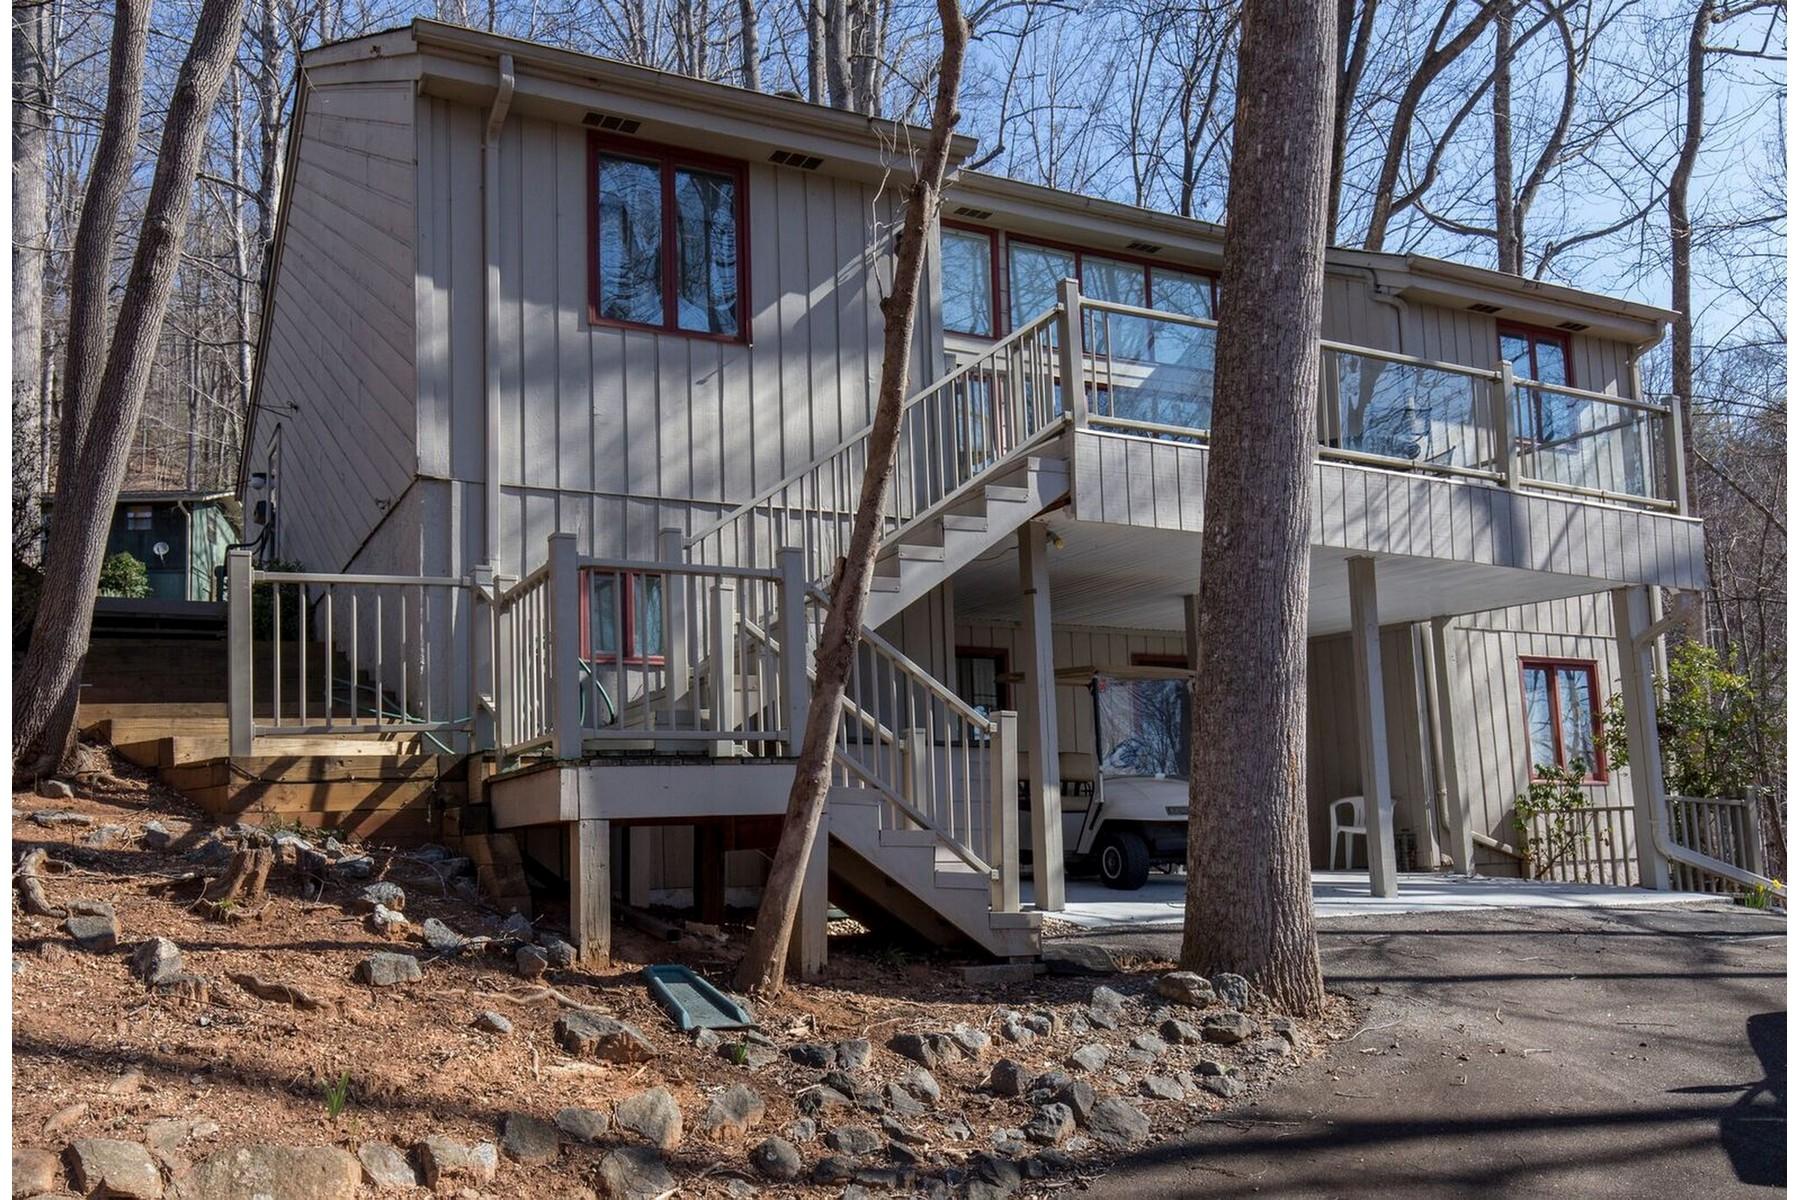 Single Family Home for Sale at 192 White Pine Drive, Lake Lure Lake Lure, North Carolina, 28746 United States